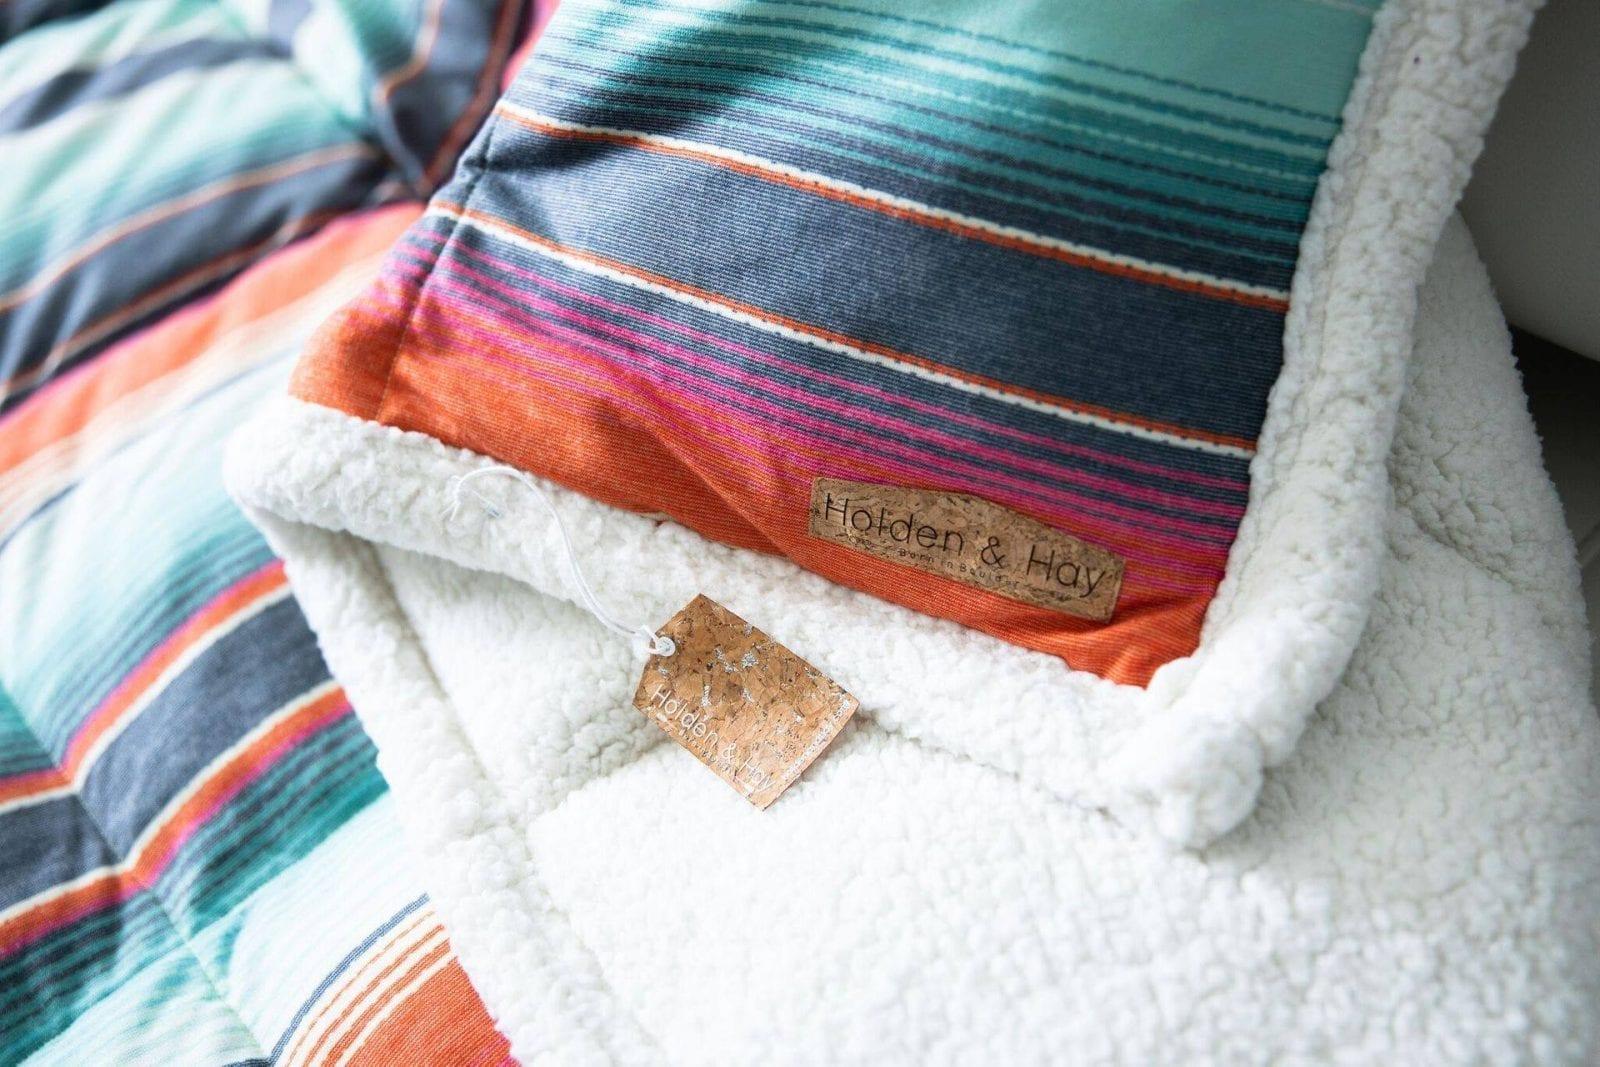 Image of a Holden & Hay duvet